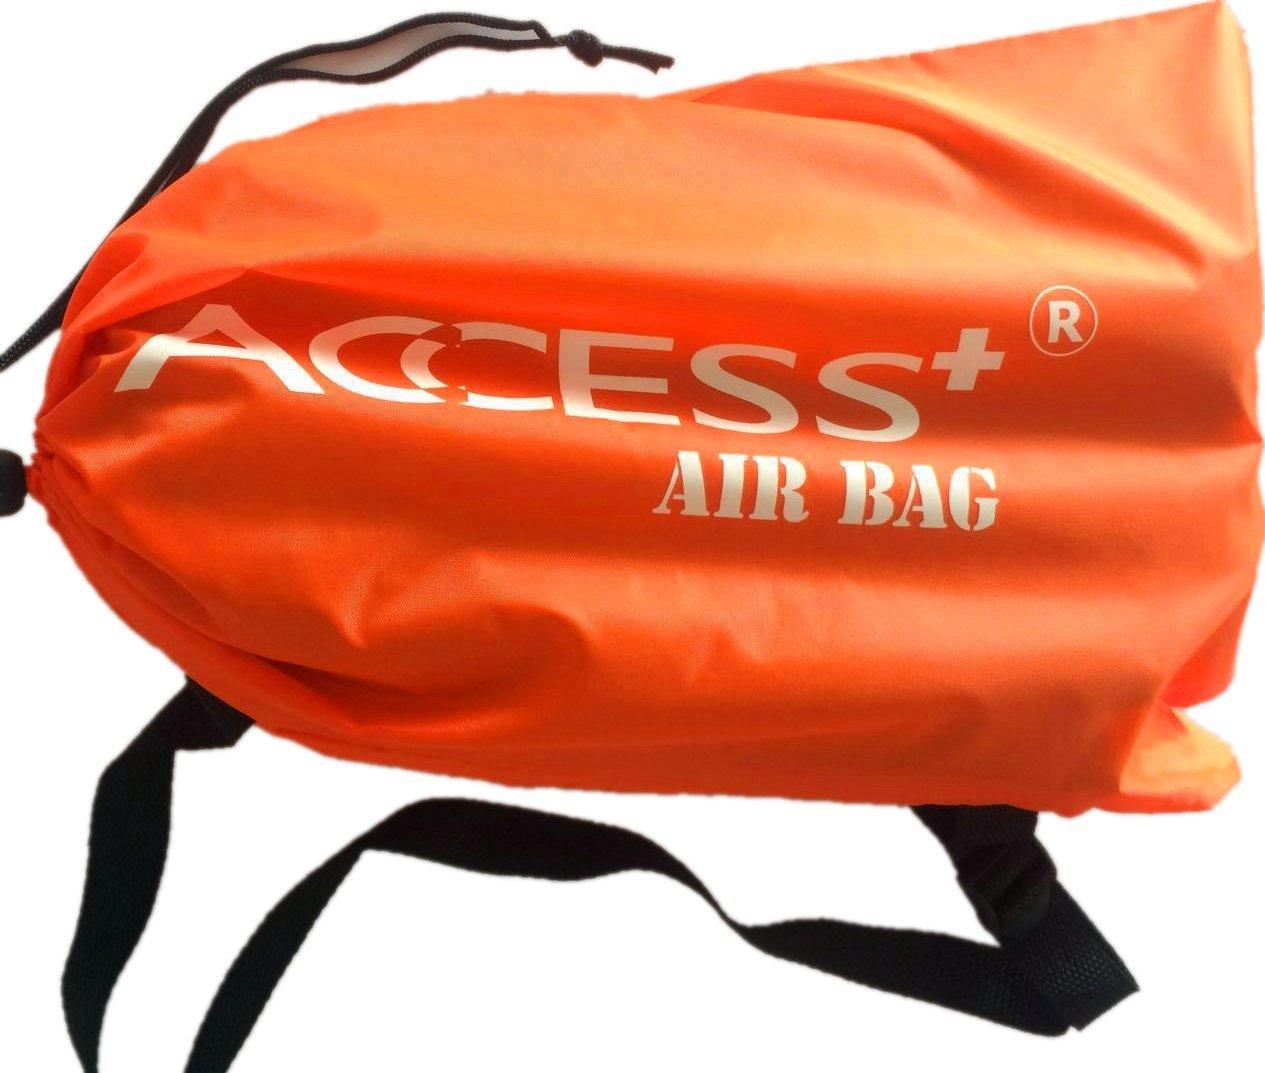 nuevo diseño] Access + ® sofá tumbona hinchable, saco de ...